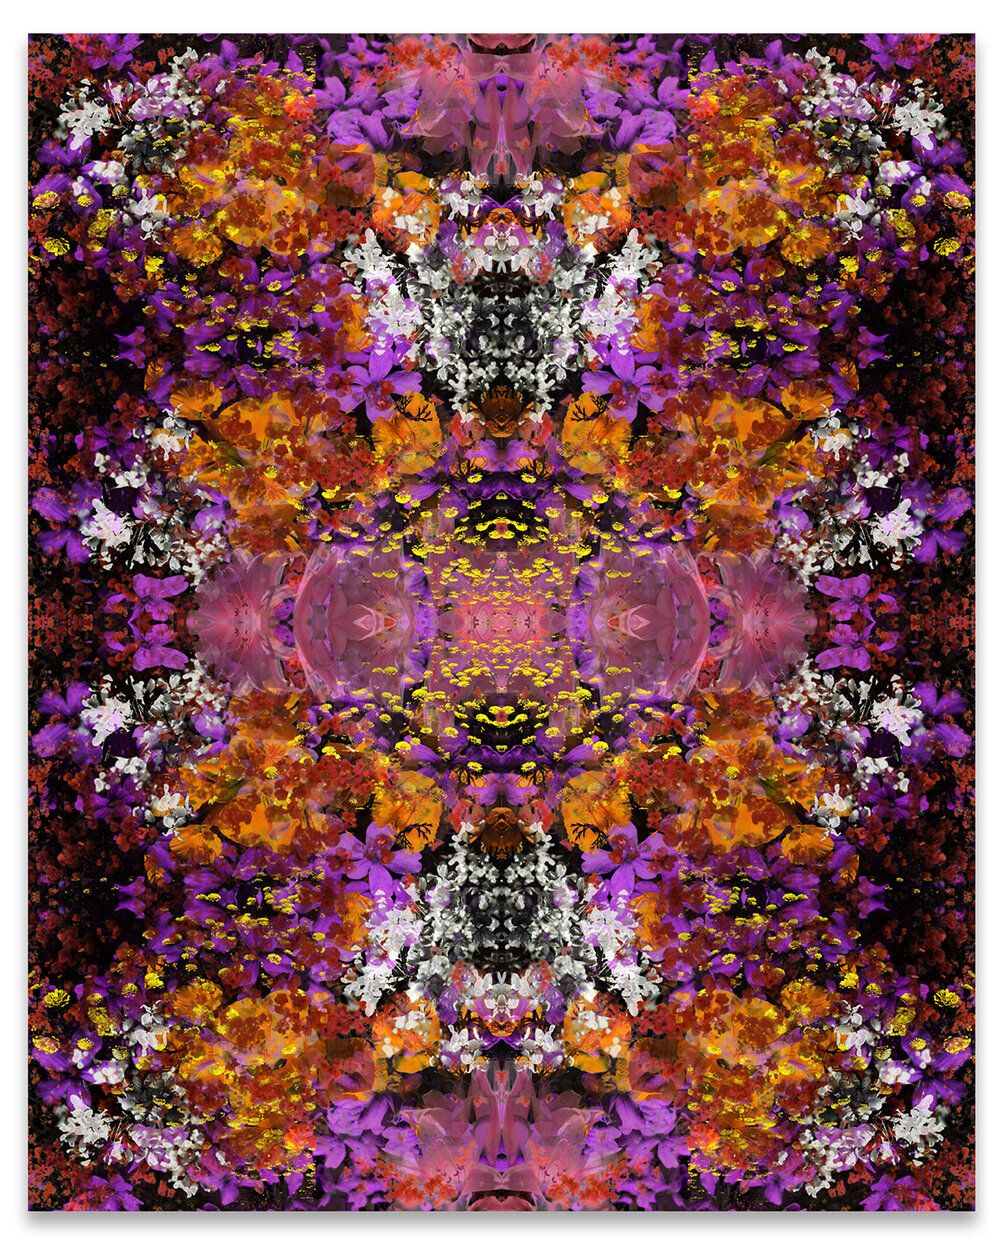 © FLOWERS COMPOSITION No.9